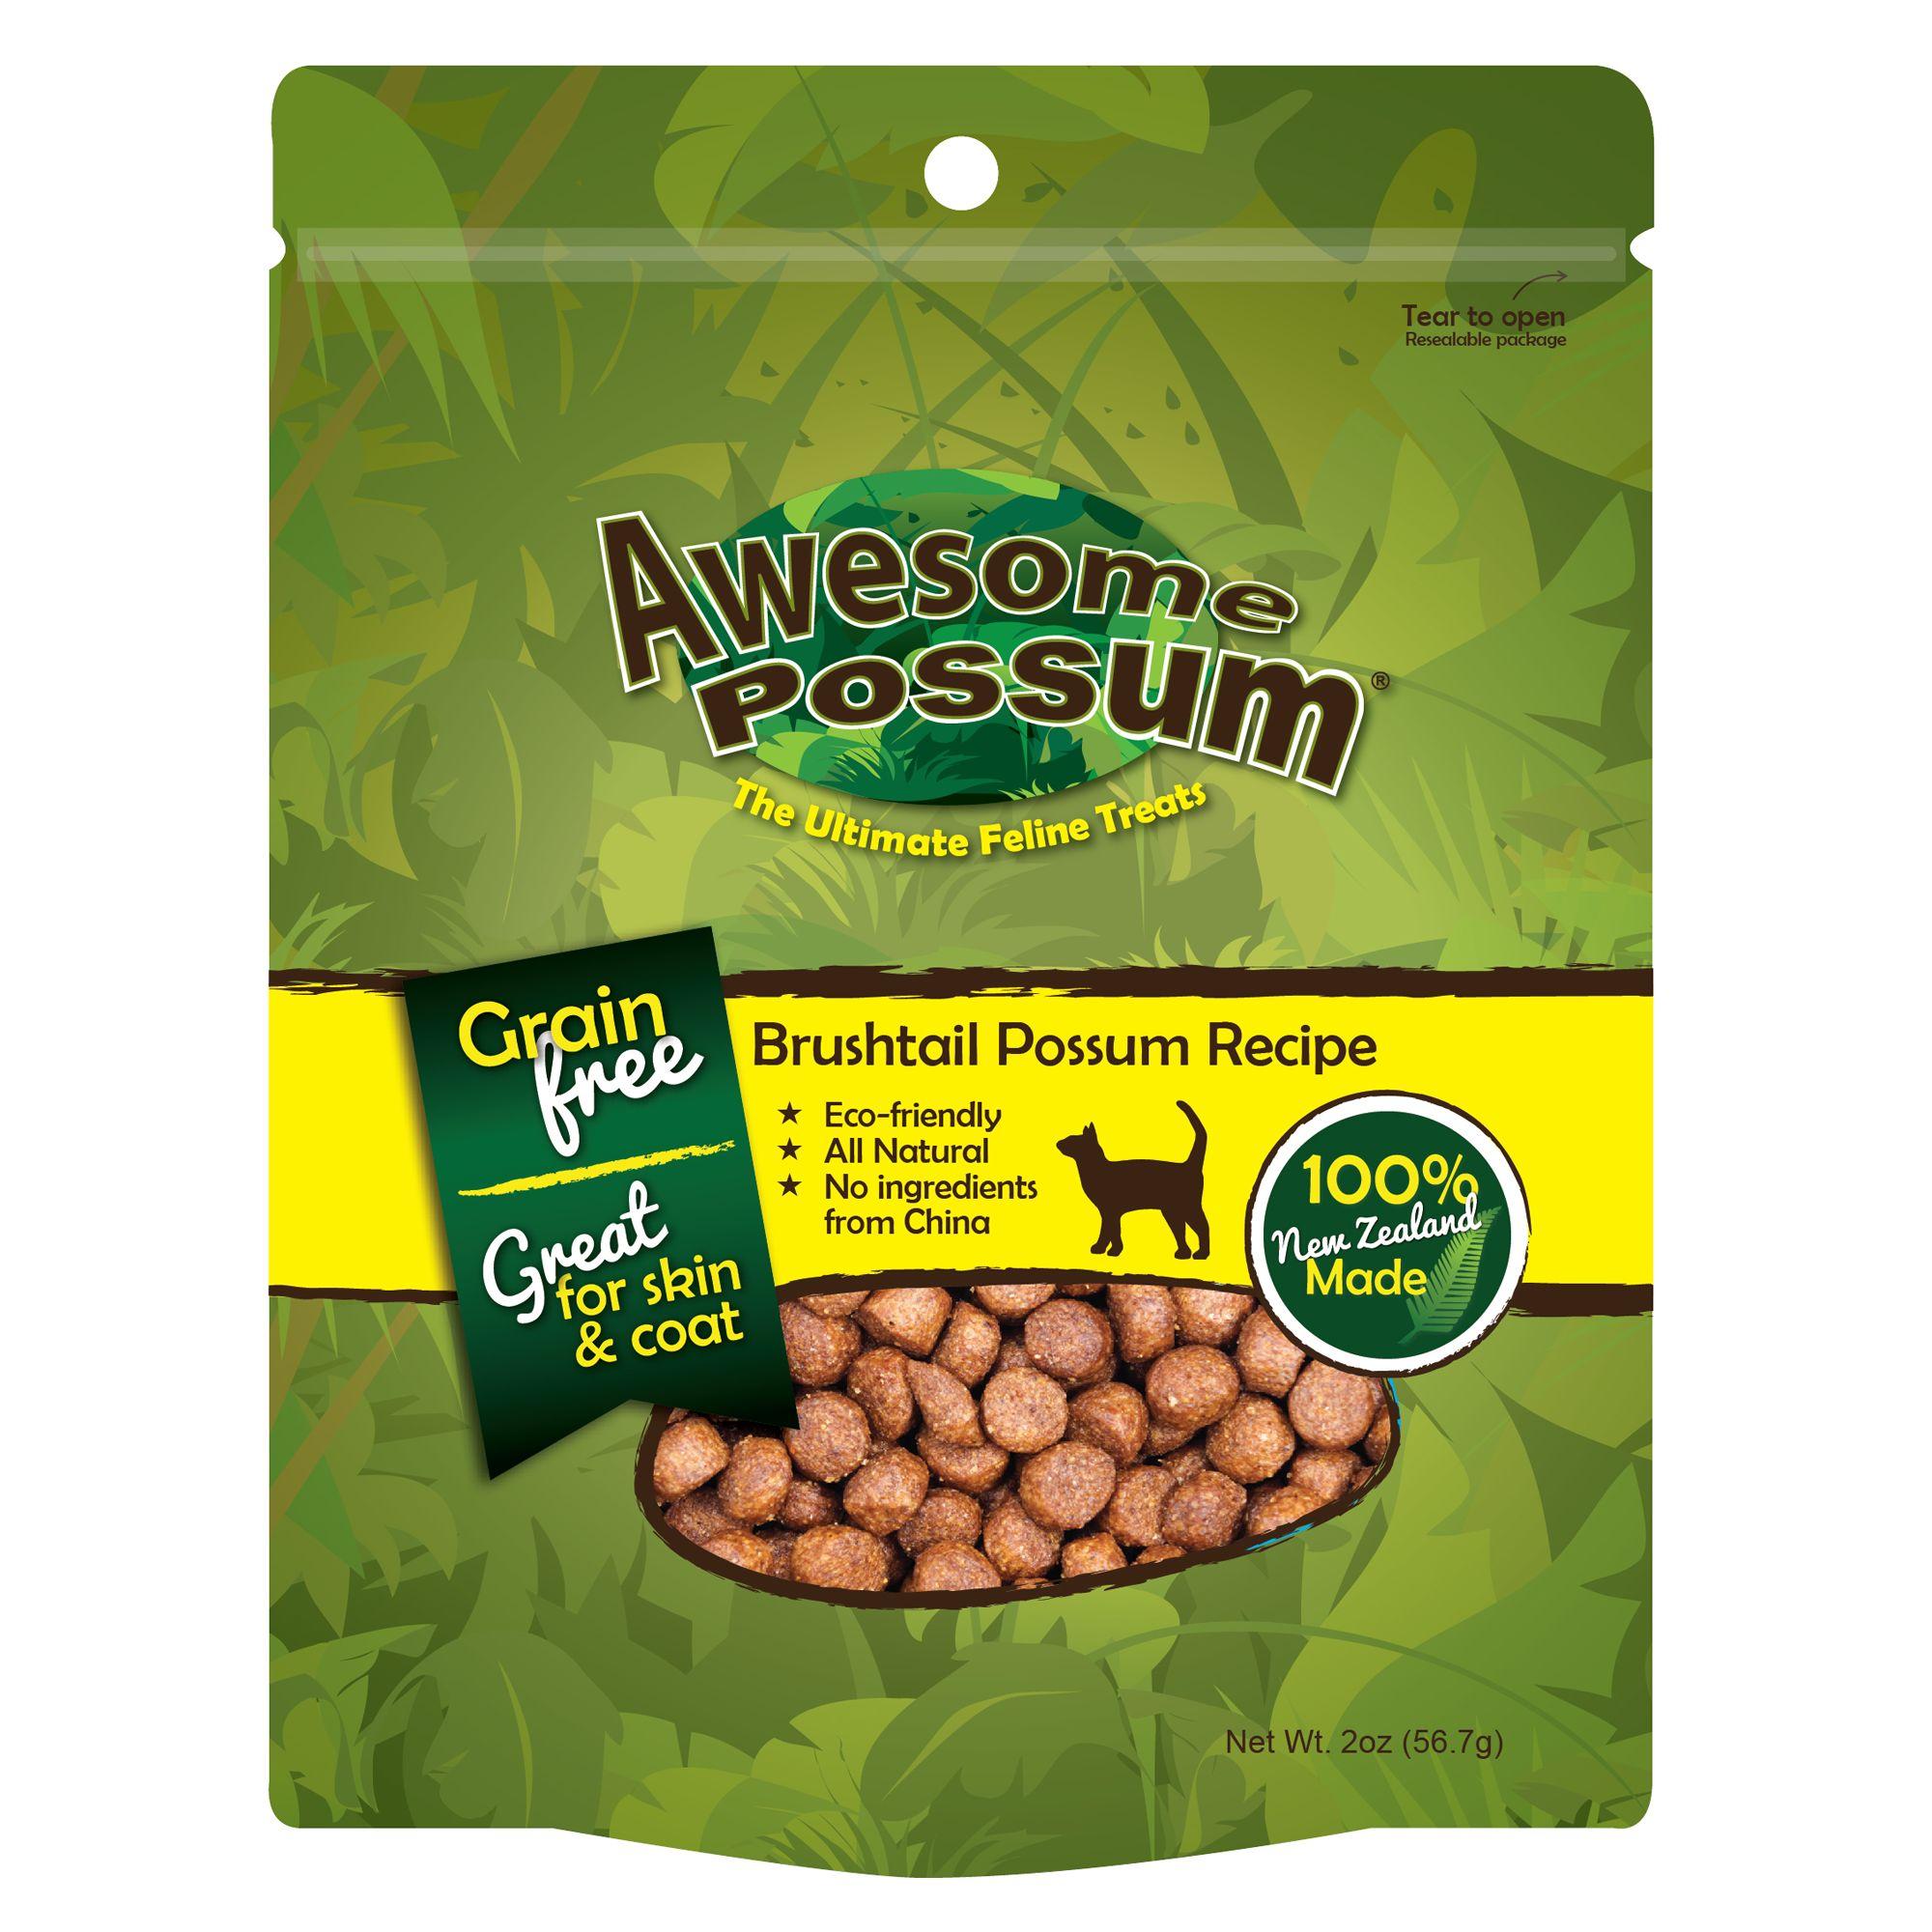 Awesome Possum Cat Treat Natural Grain Free Brushtail Possum Recipe Size 2 Oz